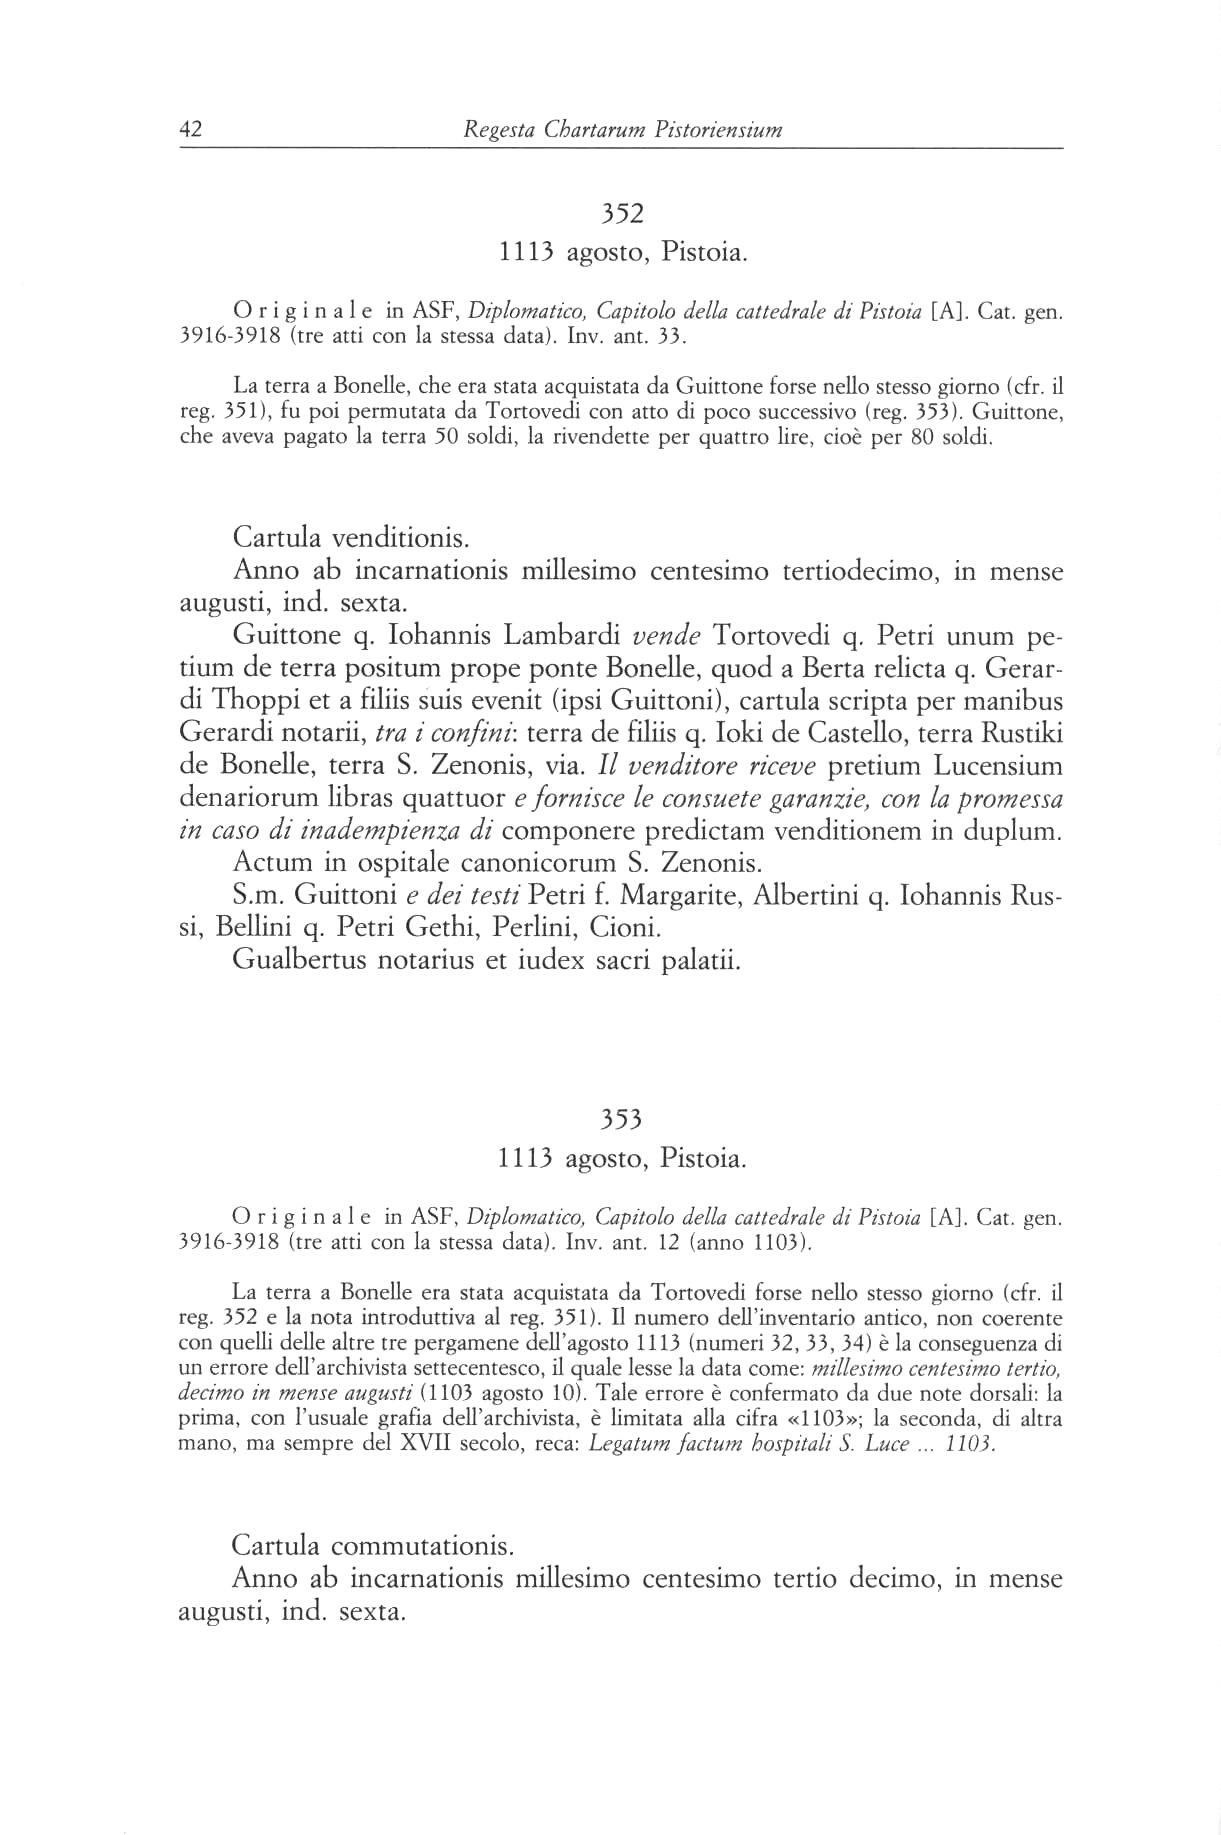 Canonica S. Zenone XII 0042.jpg